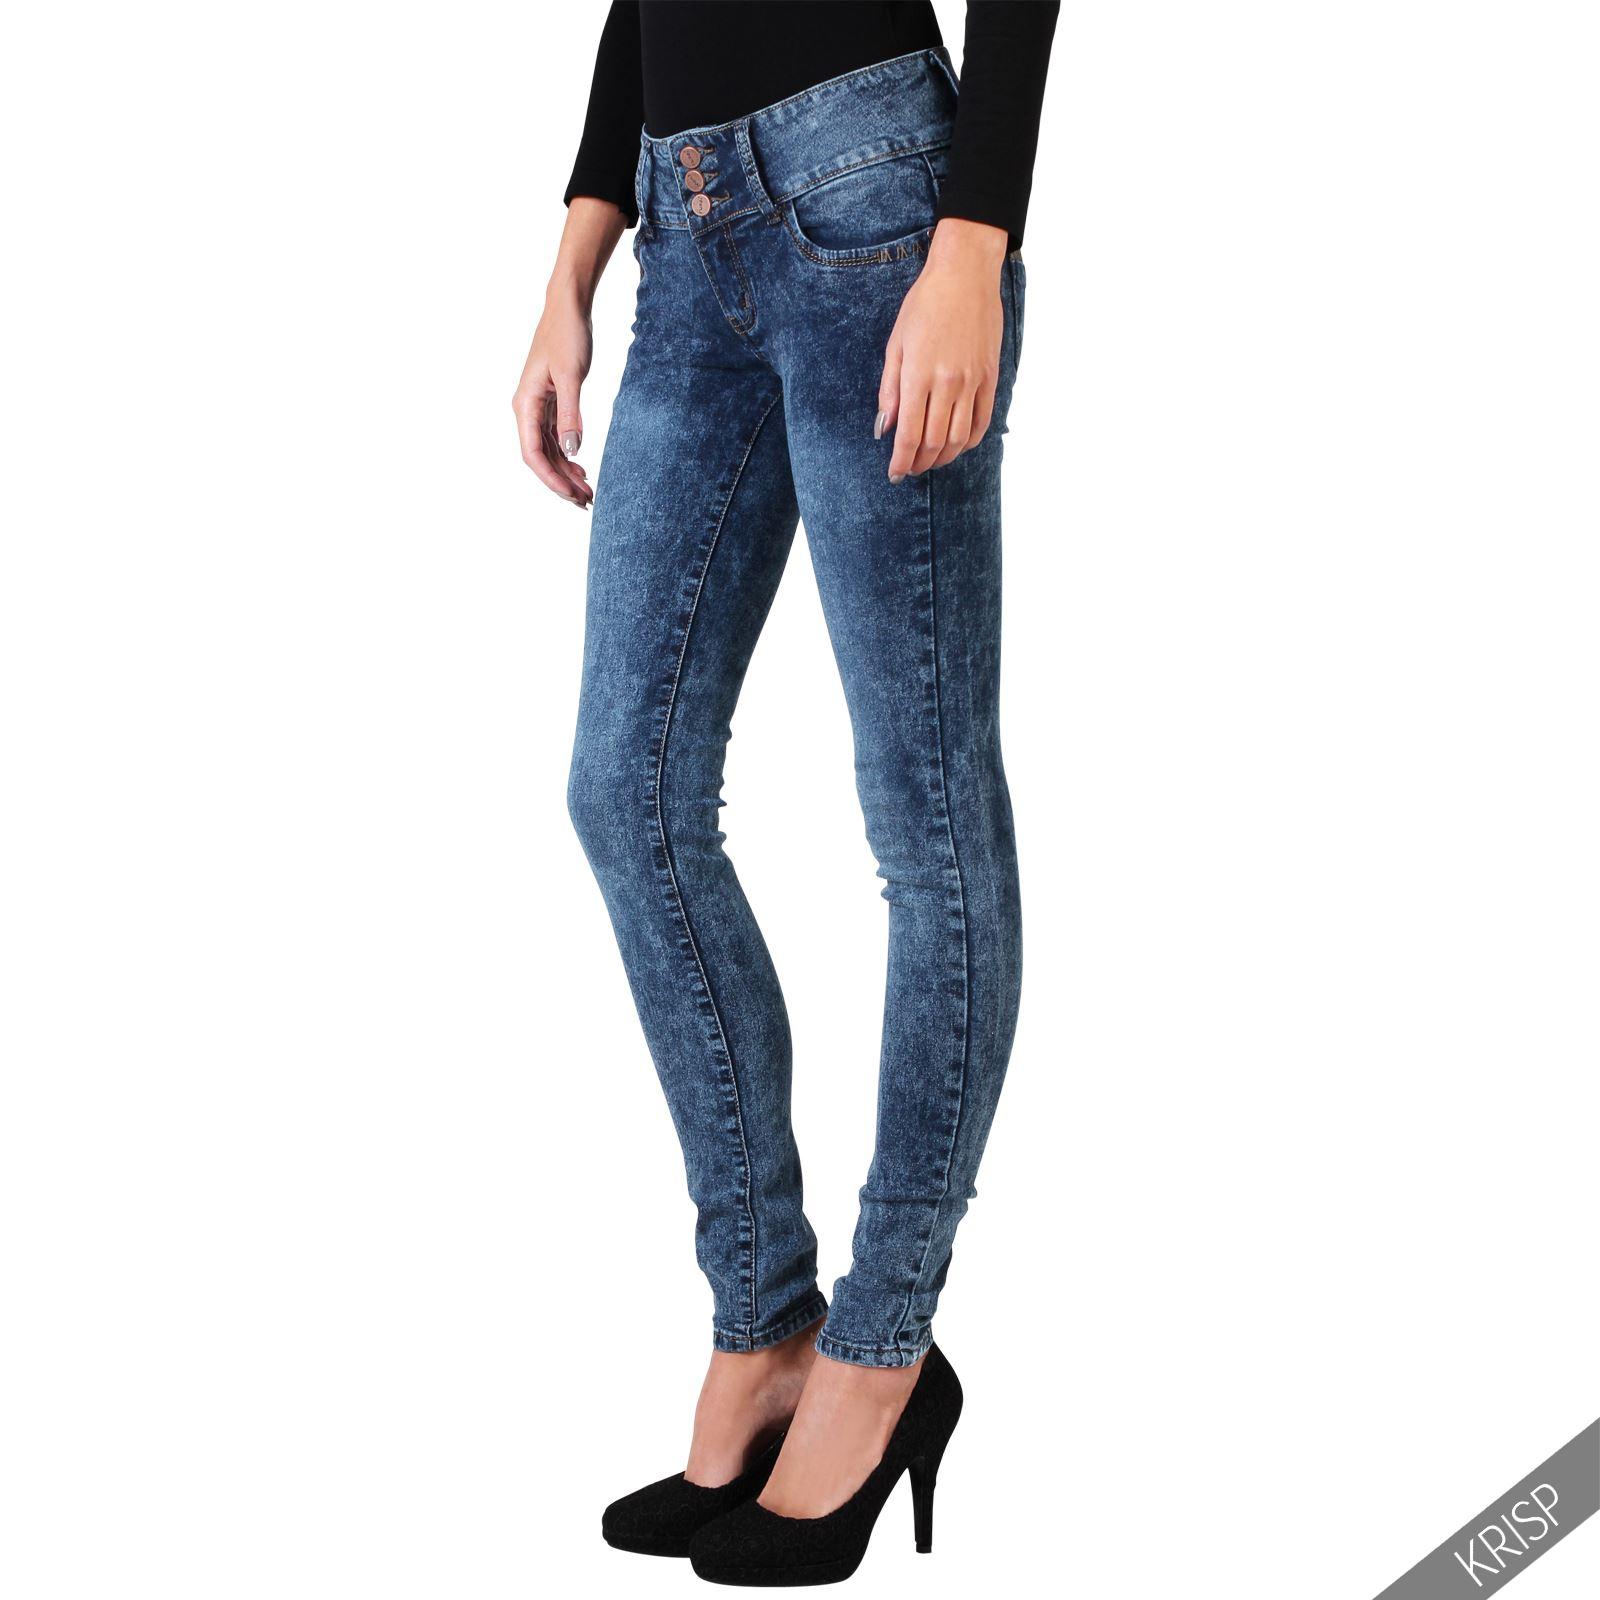 damen stretch denim jeans hoher bund high waist jeanshose hose slim skinny ebay. Black Bedroom Furniture Sets. Home Design Ideas